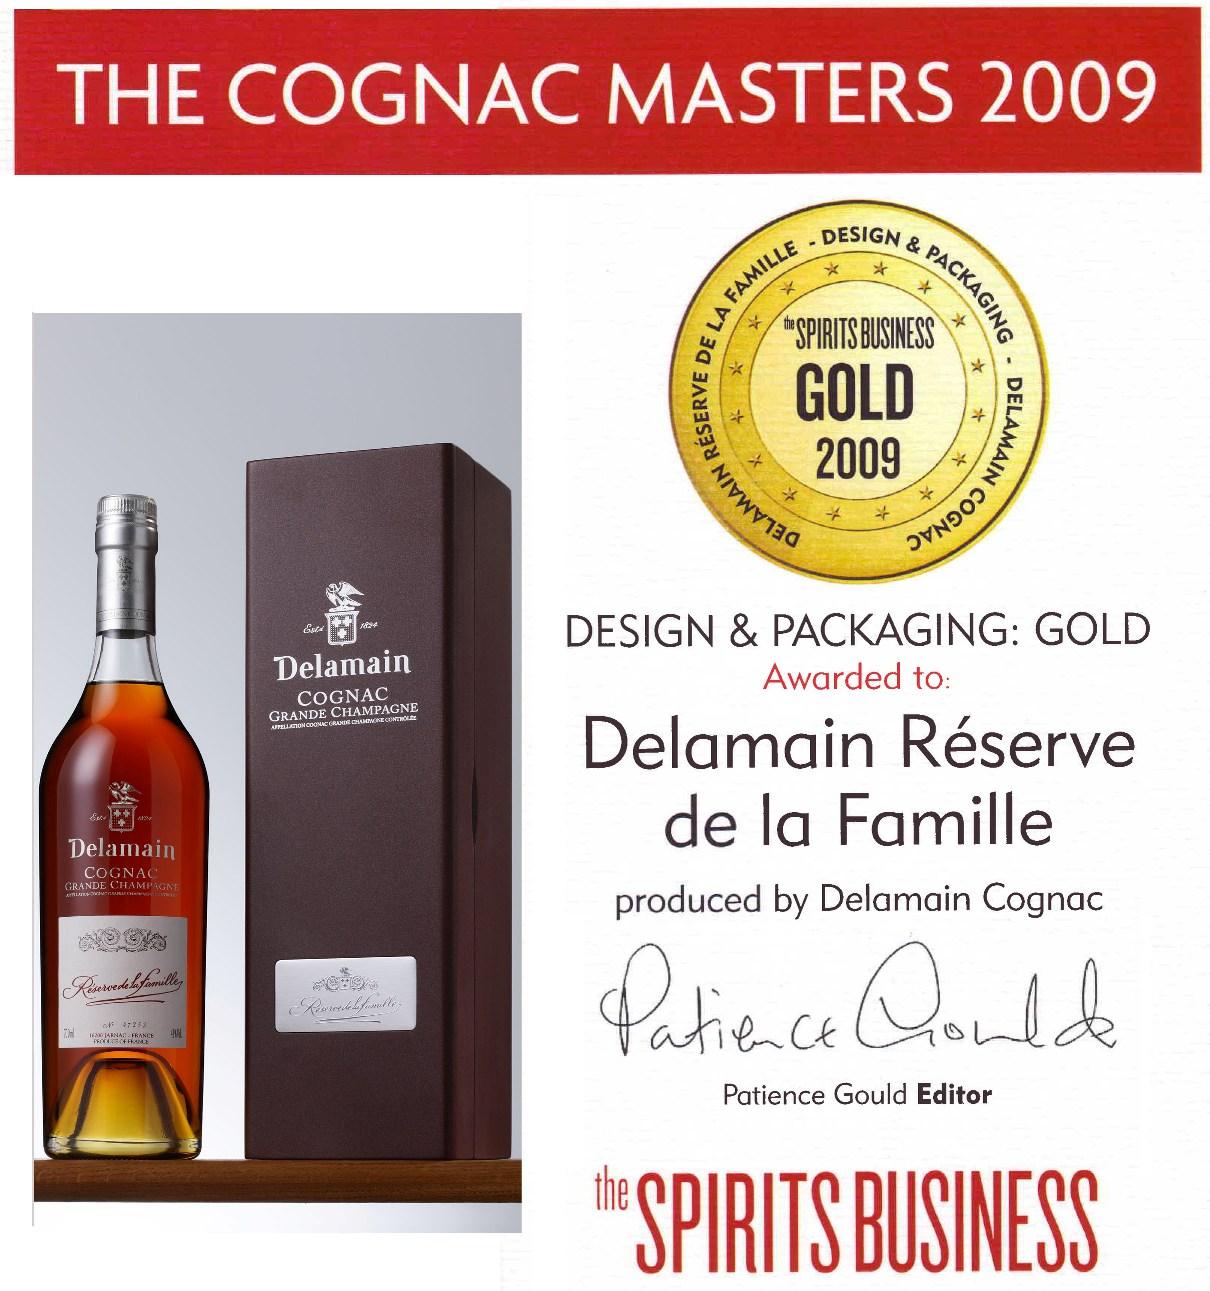 cognac 60 let delamain - famille reserve - gold medal / коньяк 60 лет